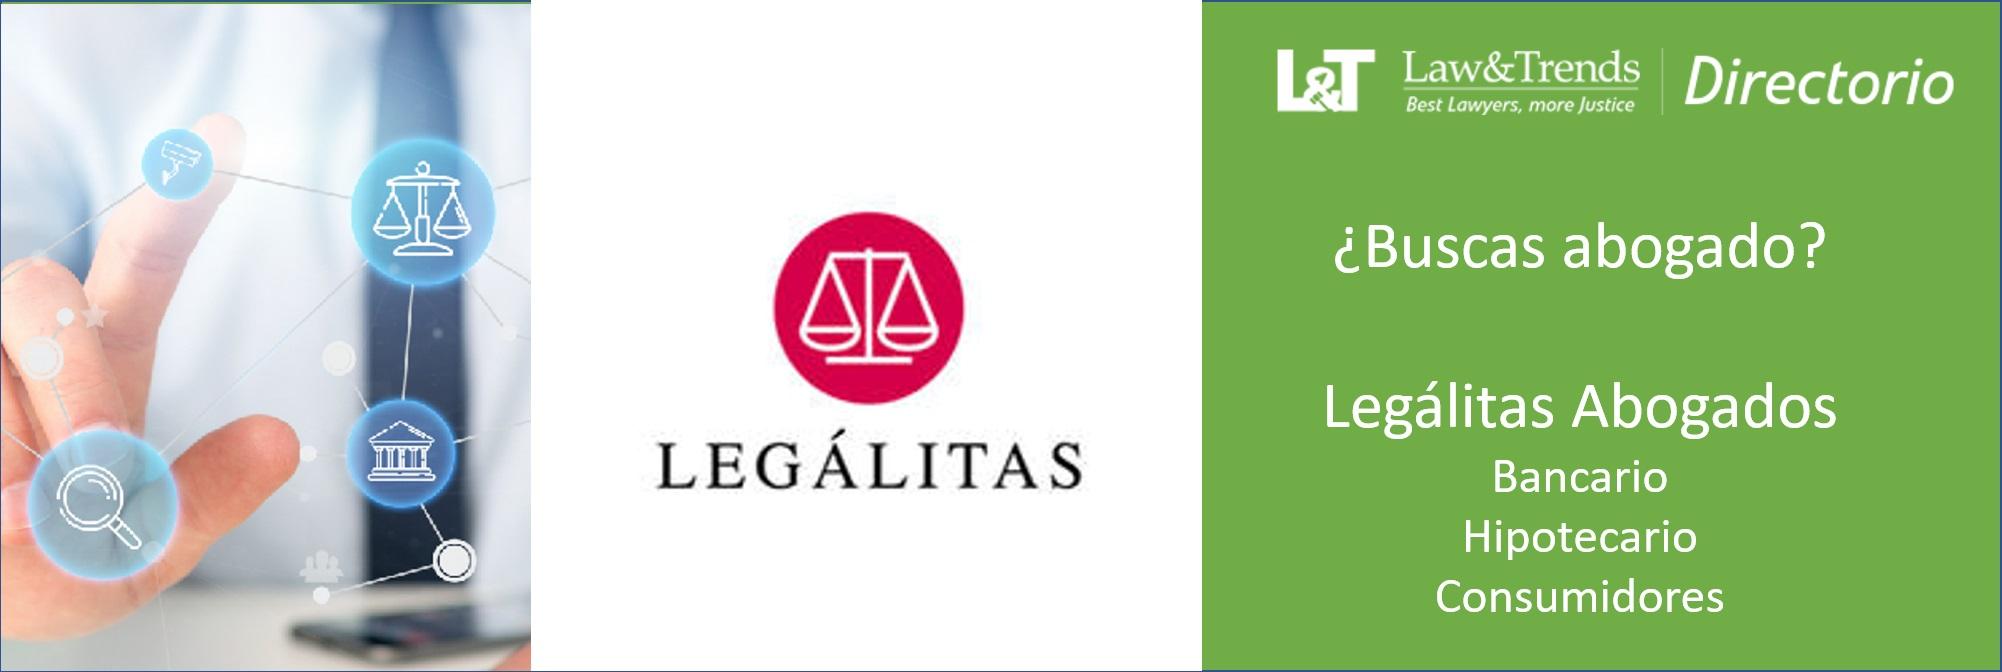 Legálitas abogados madrid